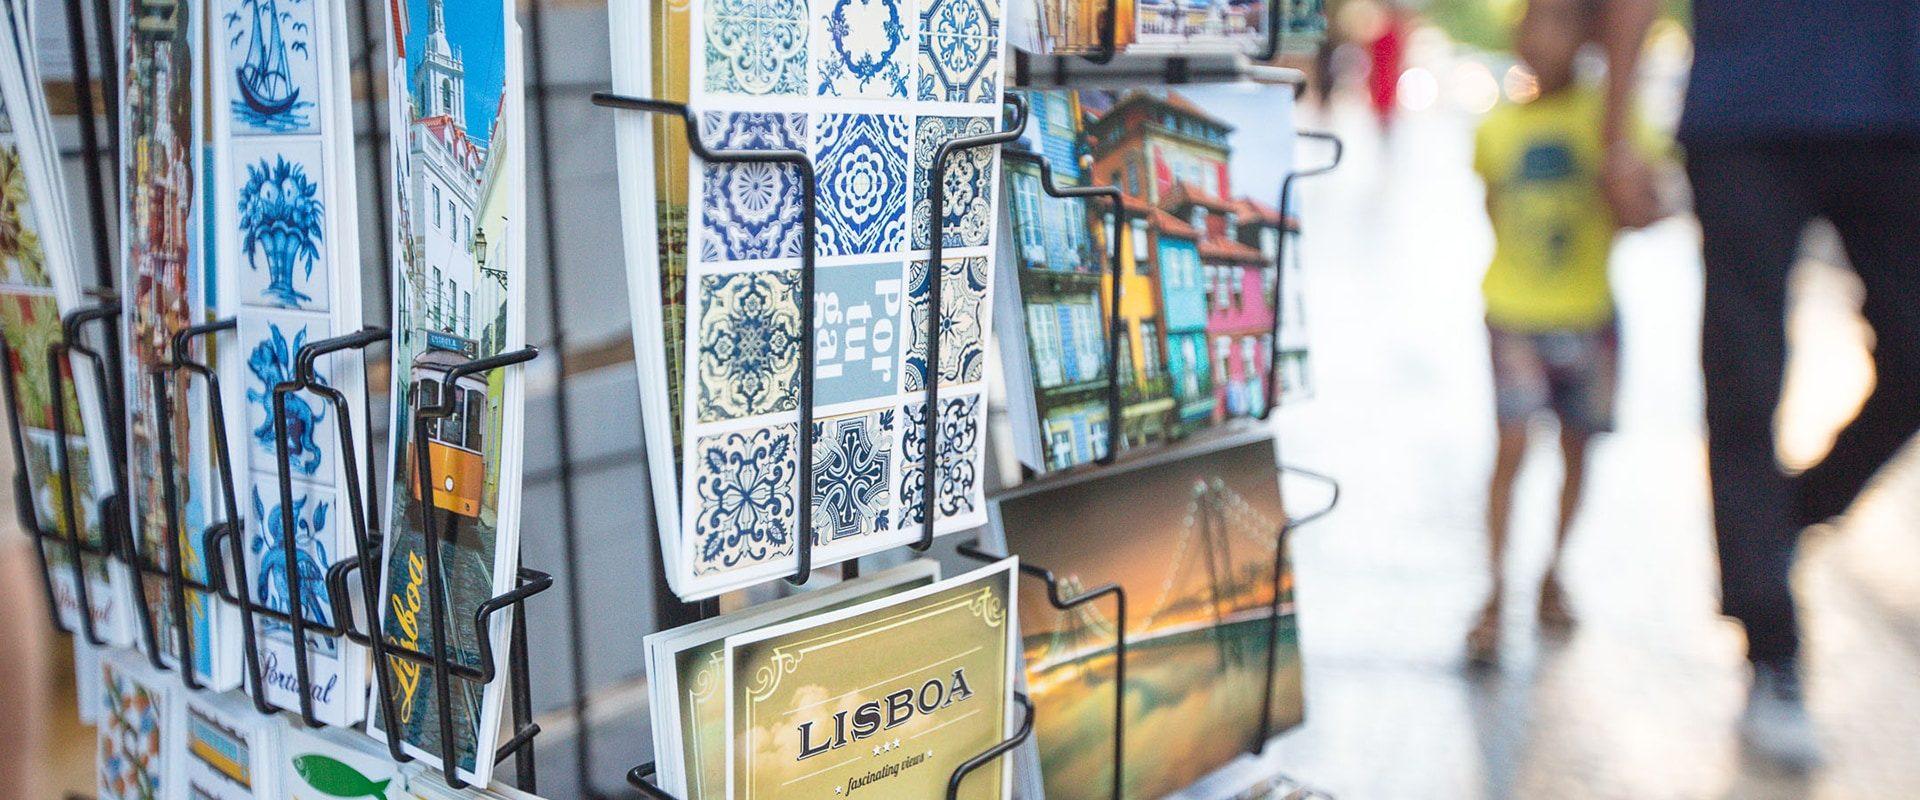 Où Dormir à Lisbonne ?